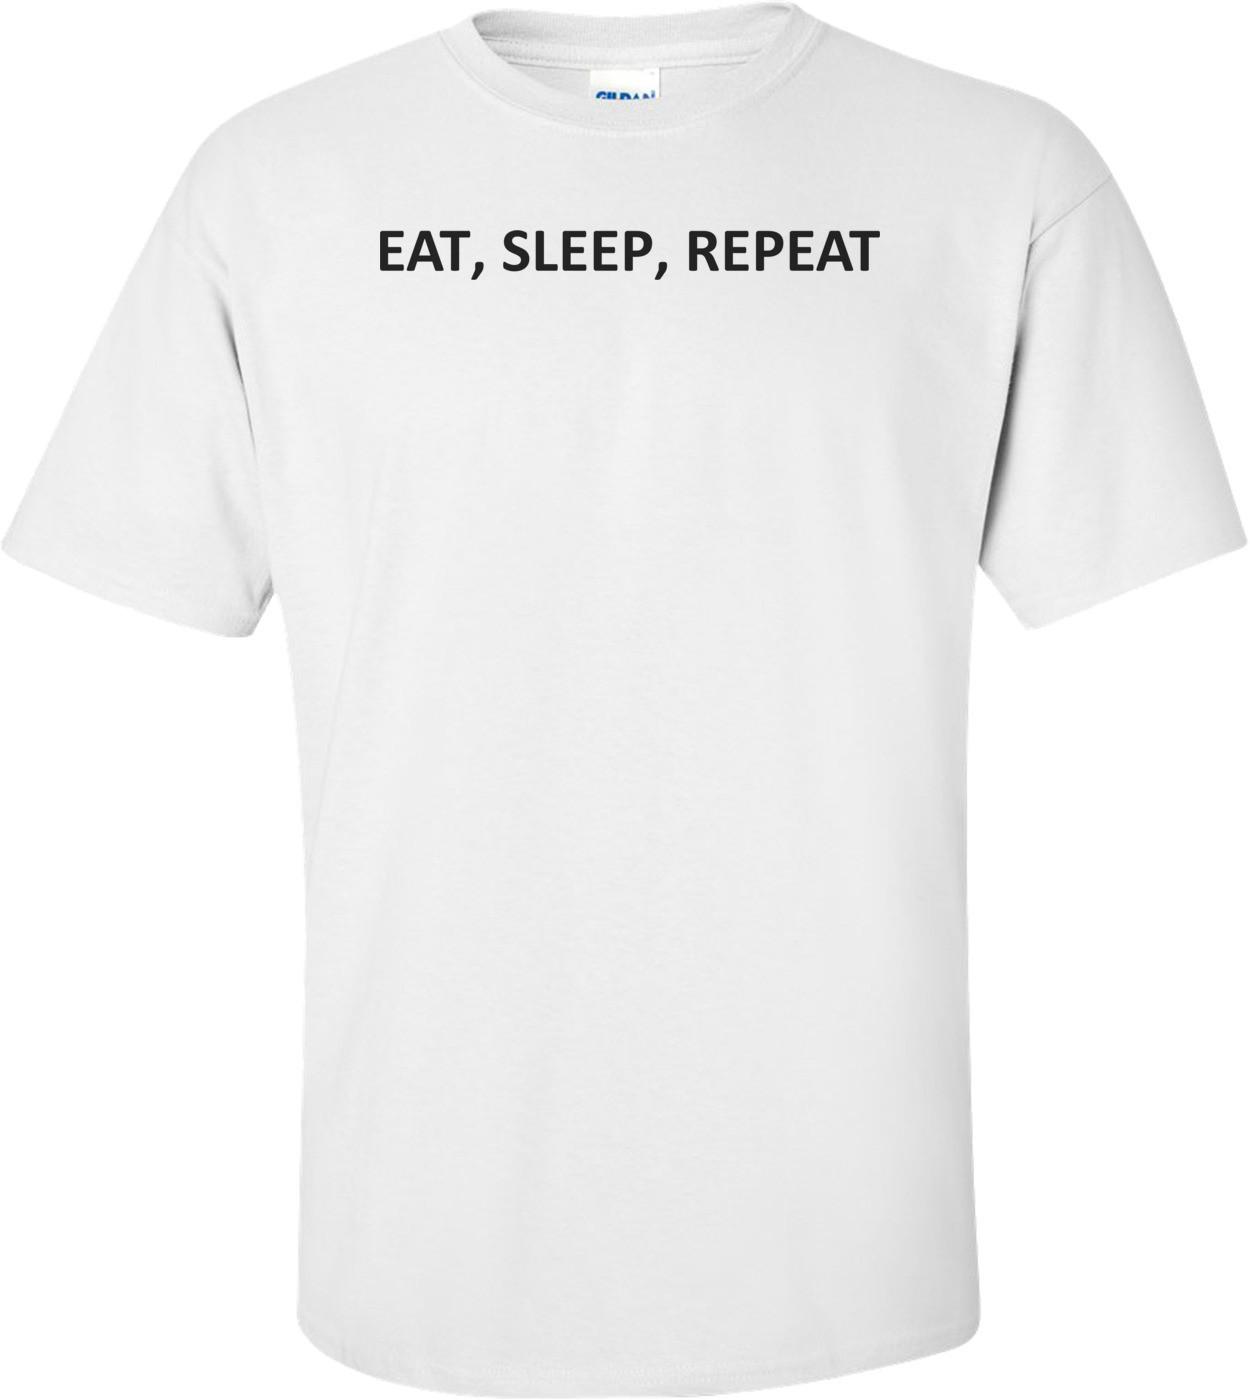 EAT, SLEEP, REPEAT Shirt